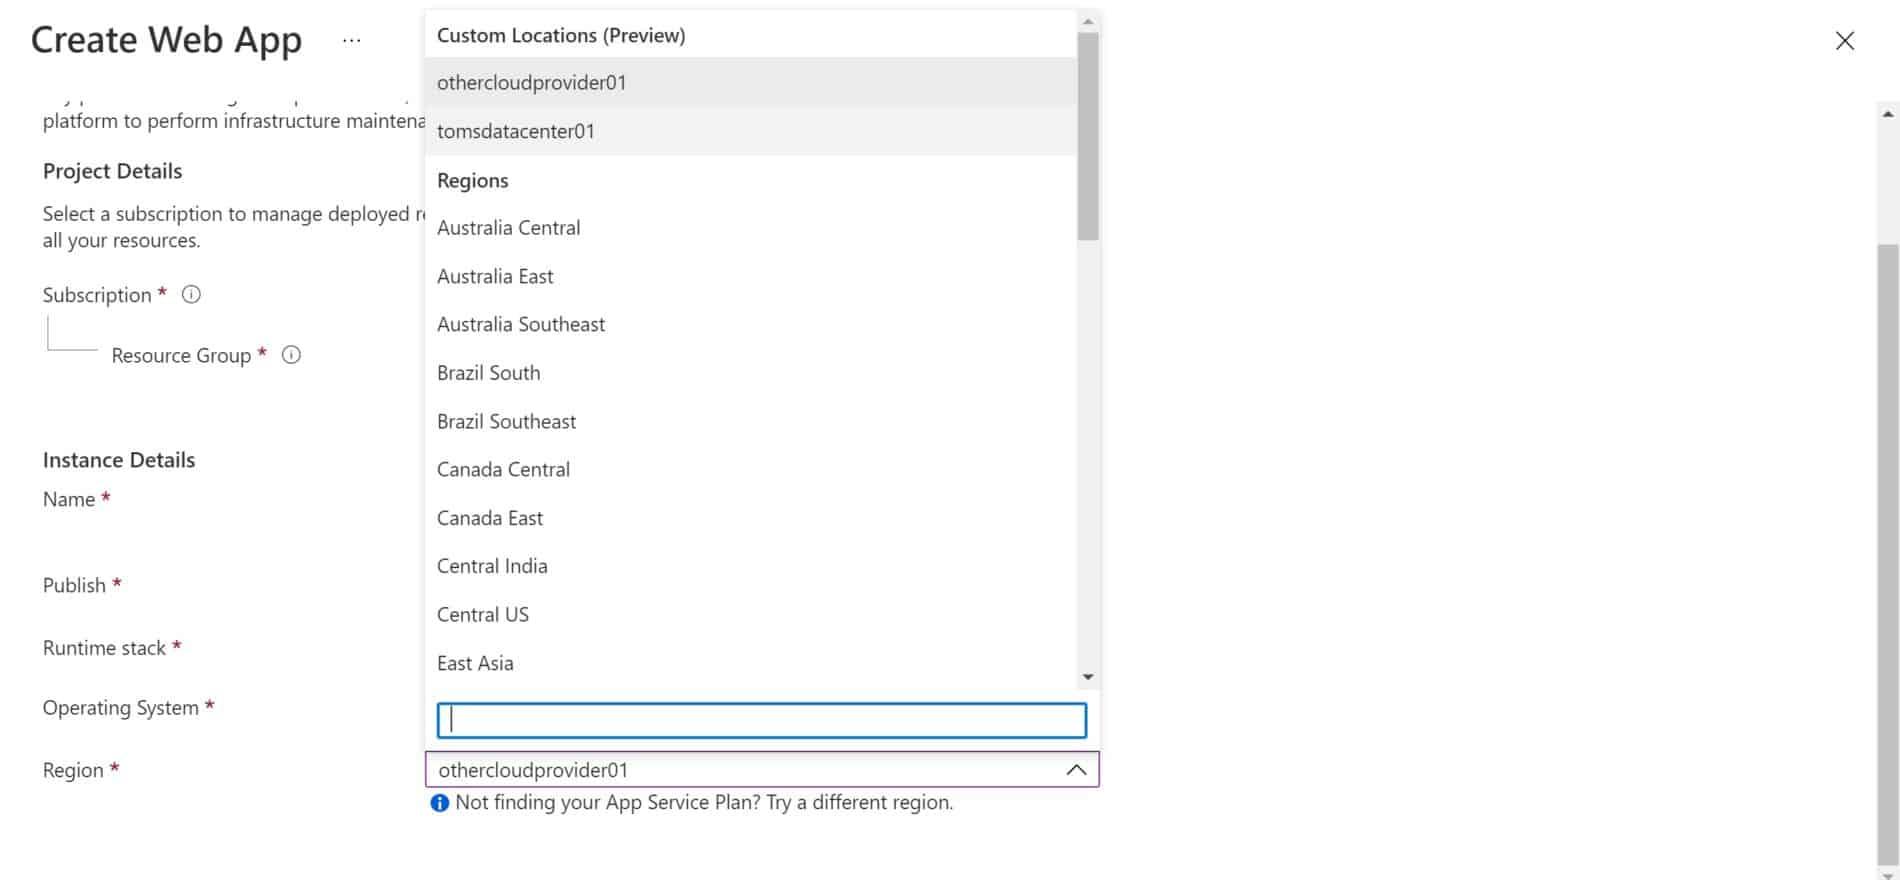 Azure Regions and custom locations